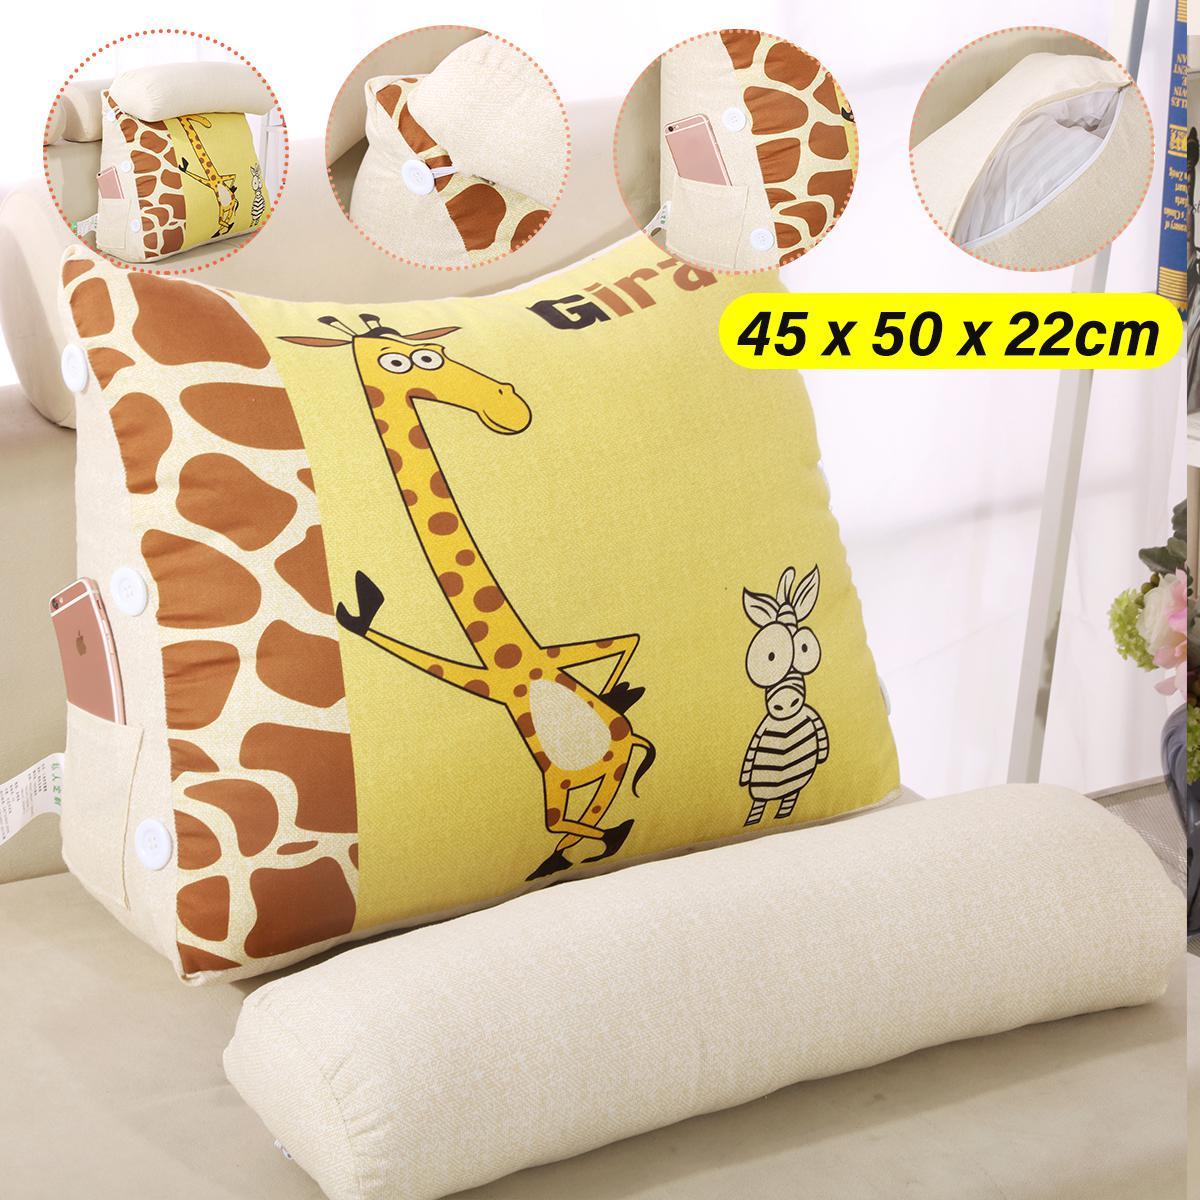 Picture of: 45cm 60cm Wedge Back Pillow Rest Sleep Neck Home Sofa Bed Lumbar Office Cushion 45cm Style A Matt Blatt